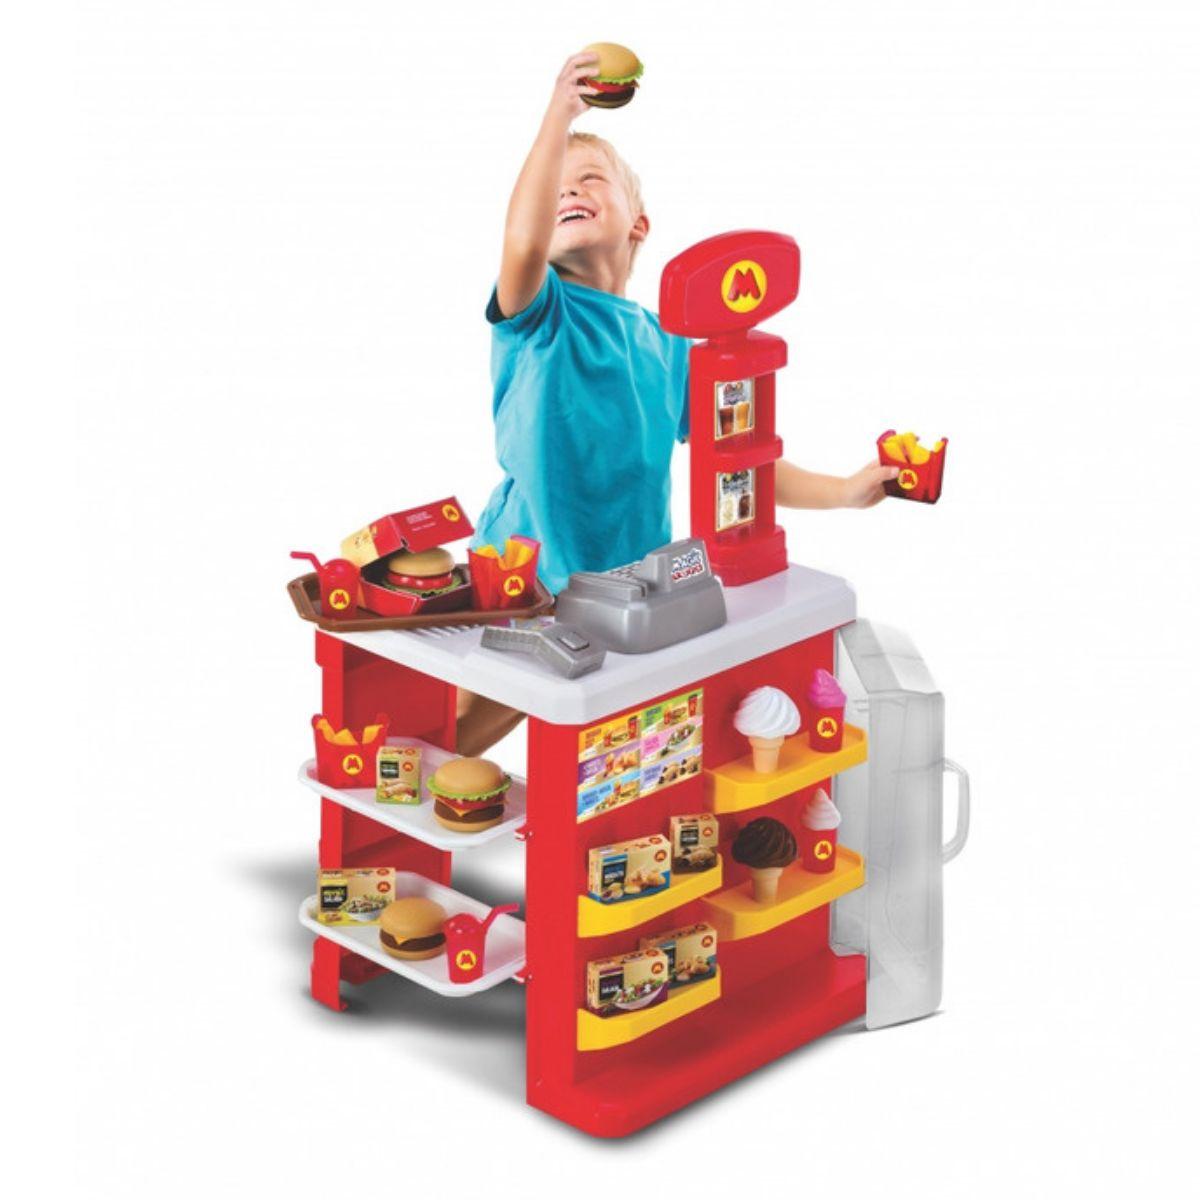 Cozinha Infantil Lanchonete Hamburgueria com acessórios Magic